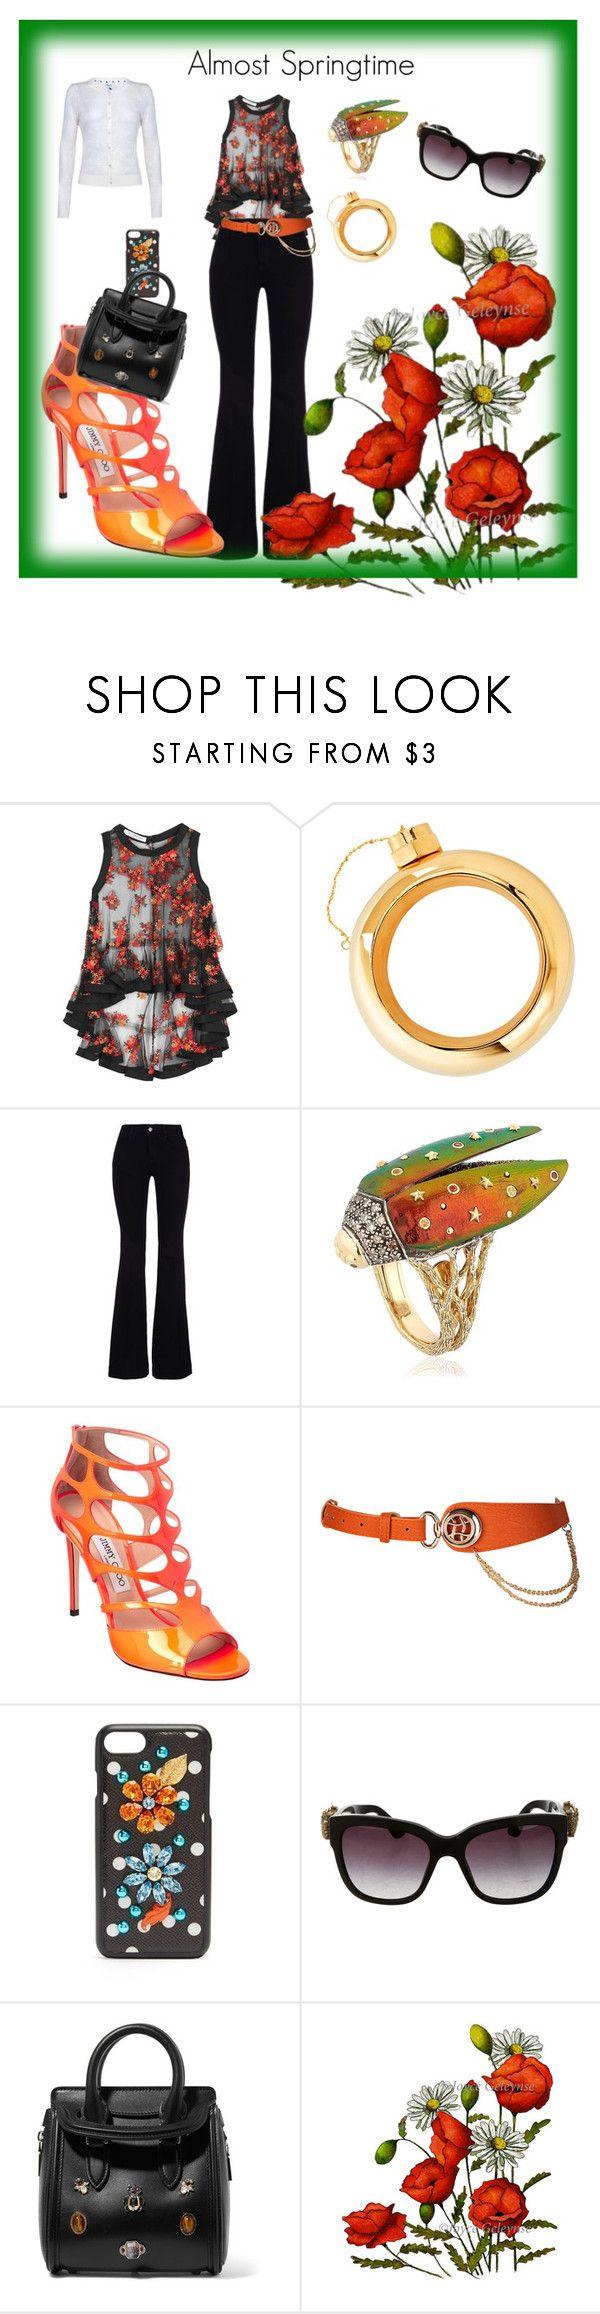 """Almost Springtime"" by cheryl-muscoe ❤ liked on Polyvore featuring Philosophy di Lorenzo Serafini, Cynthia Rowley, STELLA McCARTNEY, BIBI VAN DER VELDEN, Jimmy Choo, Dolce&Gabbana, Alexander McQueen and Yumi"